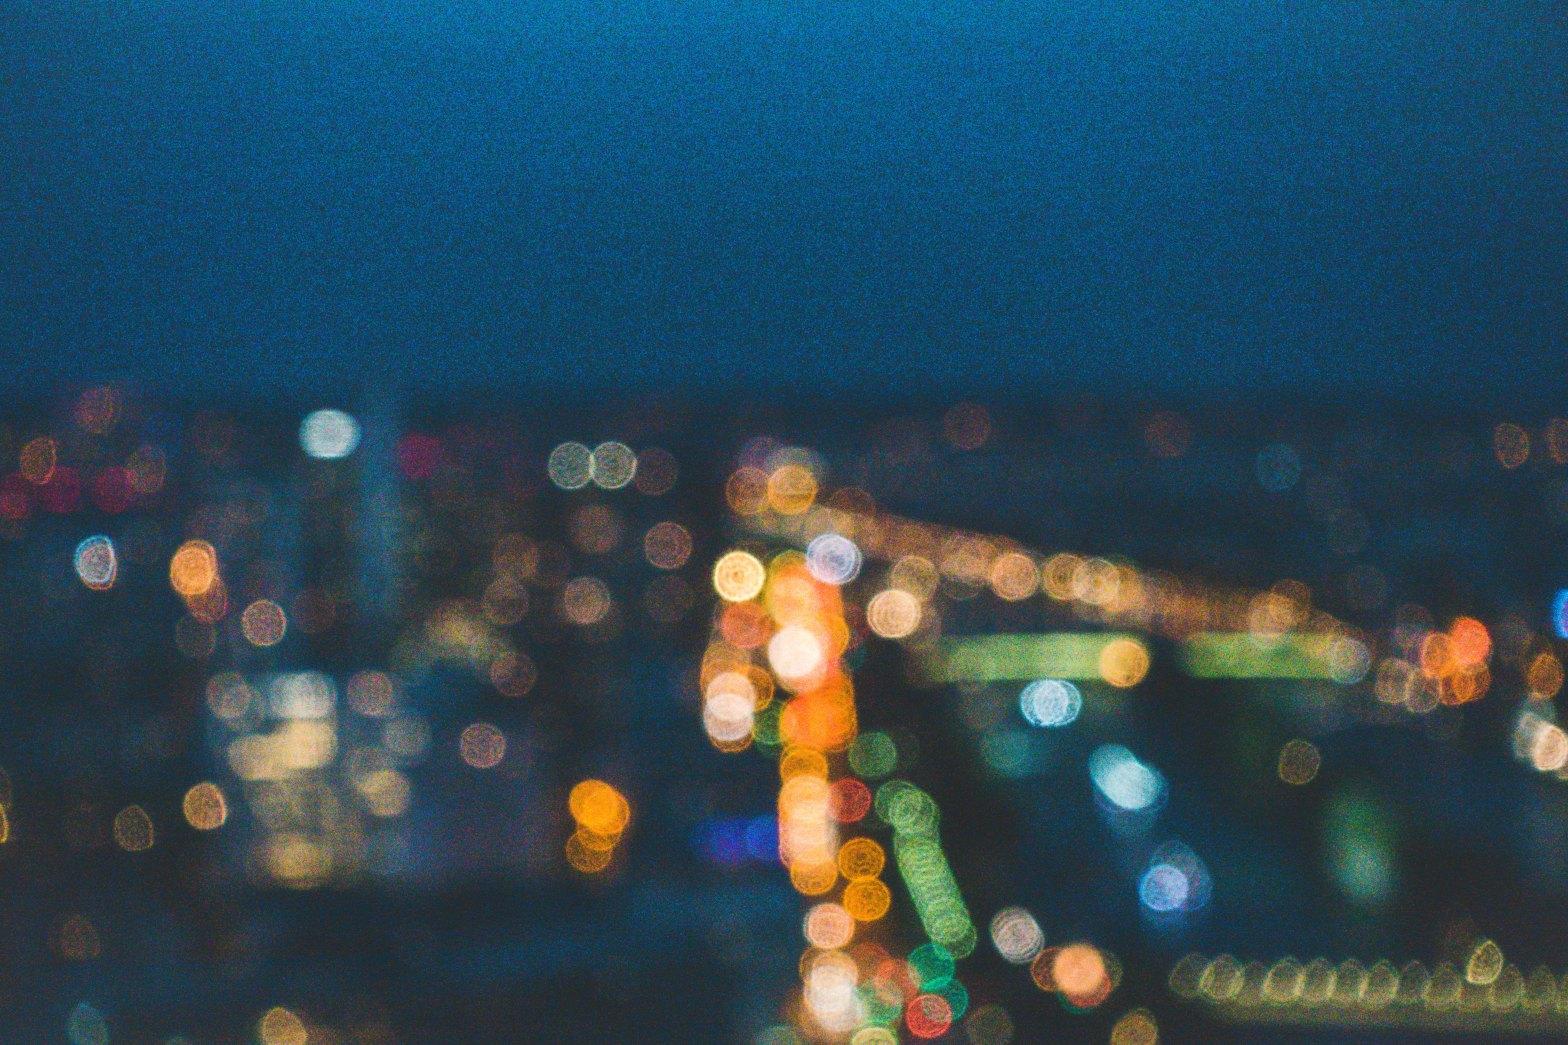 A blurred photo of city lights Photo by Sen Lin on Unsplash